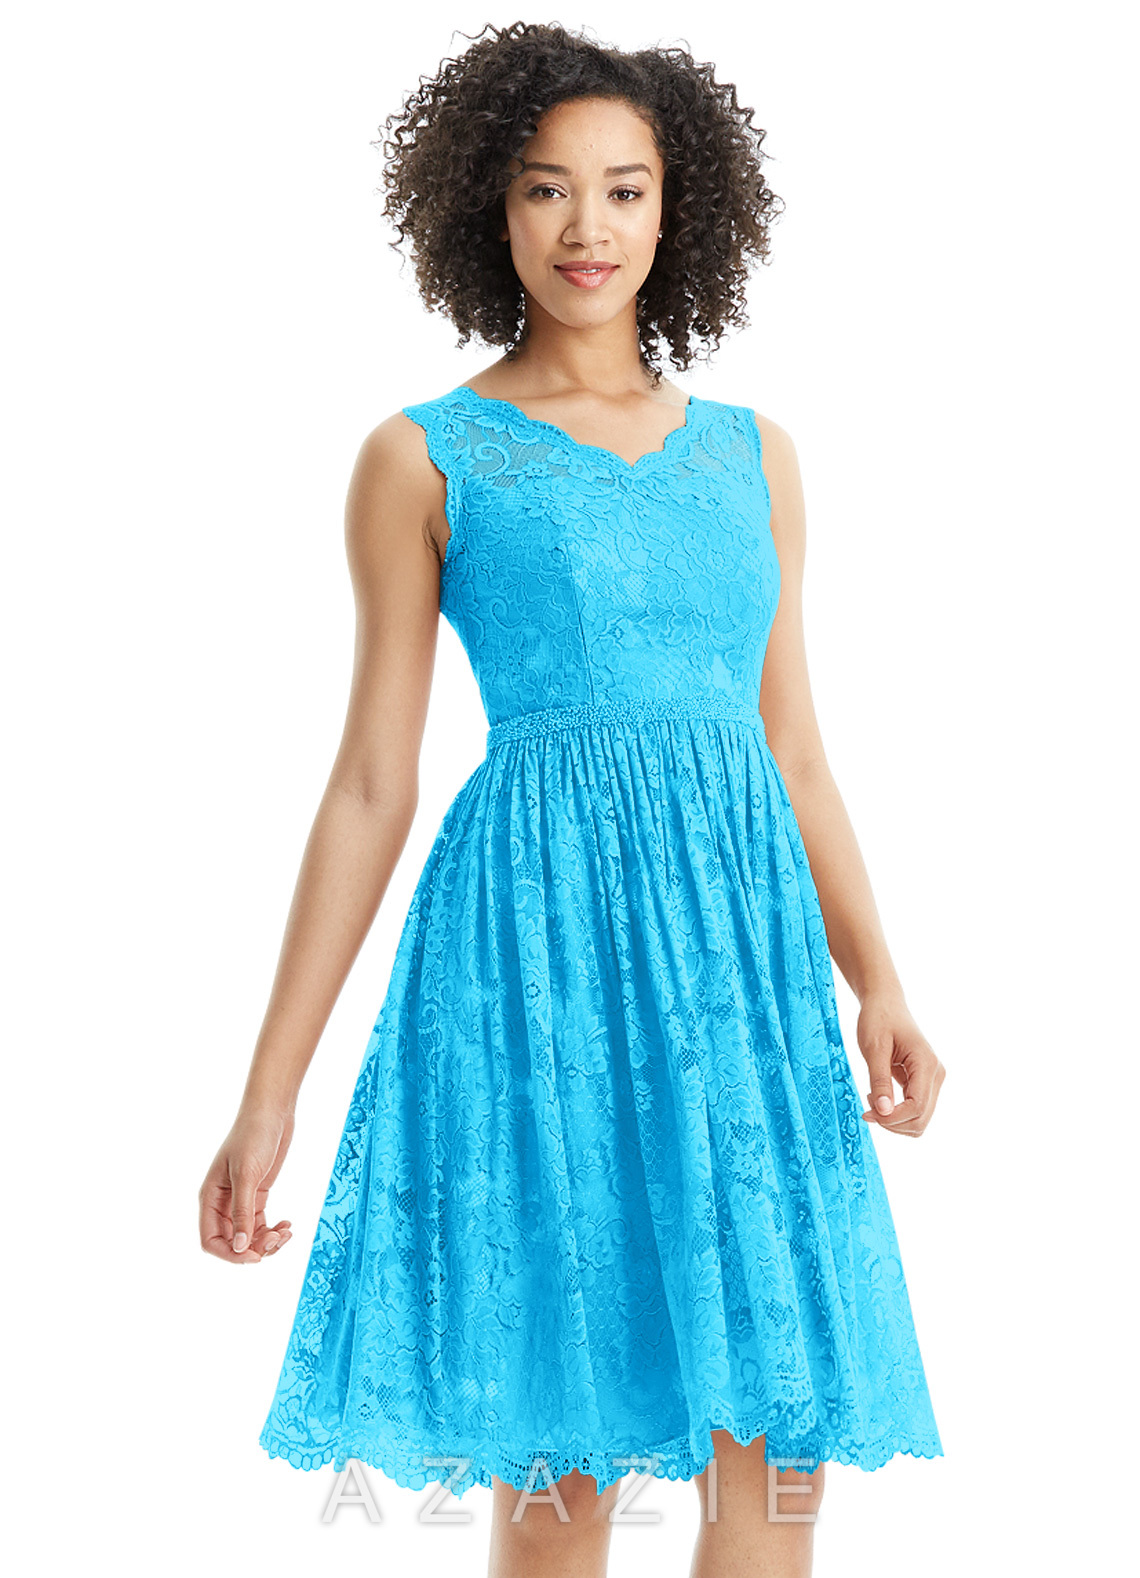 Azazie Julianne Bridesmaid Dress | Azazie